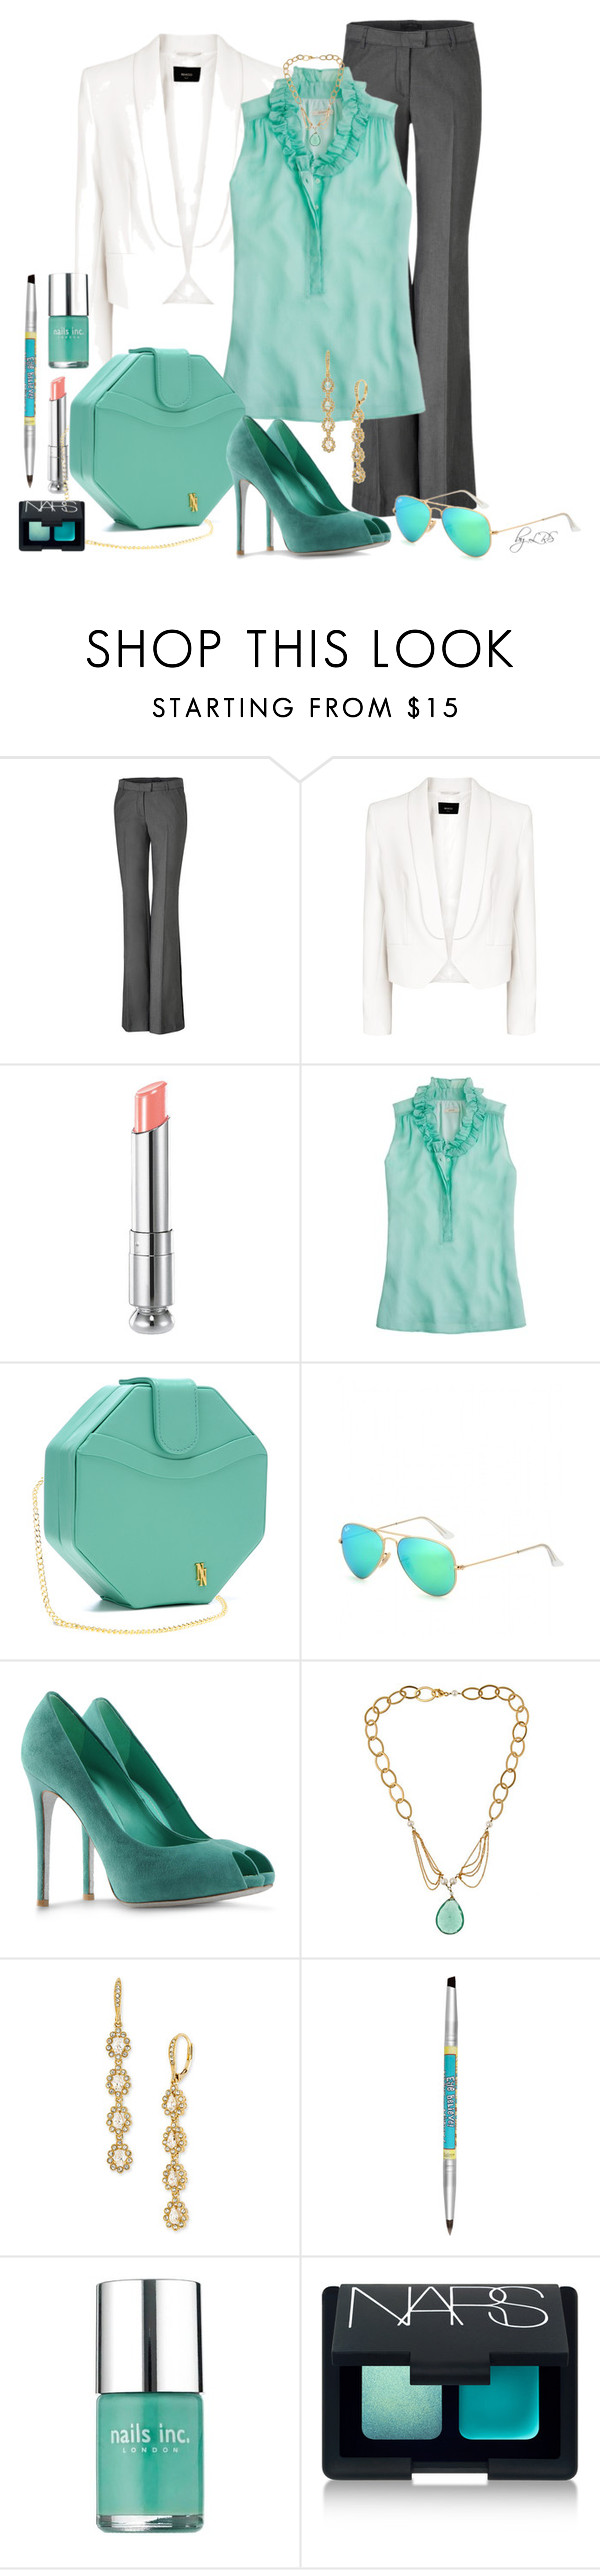 """Turquoise Blue for Work"" by fantasy-closet ❤ liked on Polyvore featuring Rachel Zoe, MANGO, Christian Dior, J.Crew, Nyla Noor, Ray-Ban, René Caovilla, Amanda Rudey, Nadri and TheBalm"